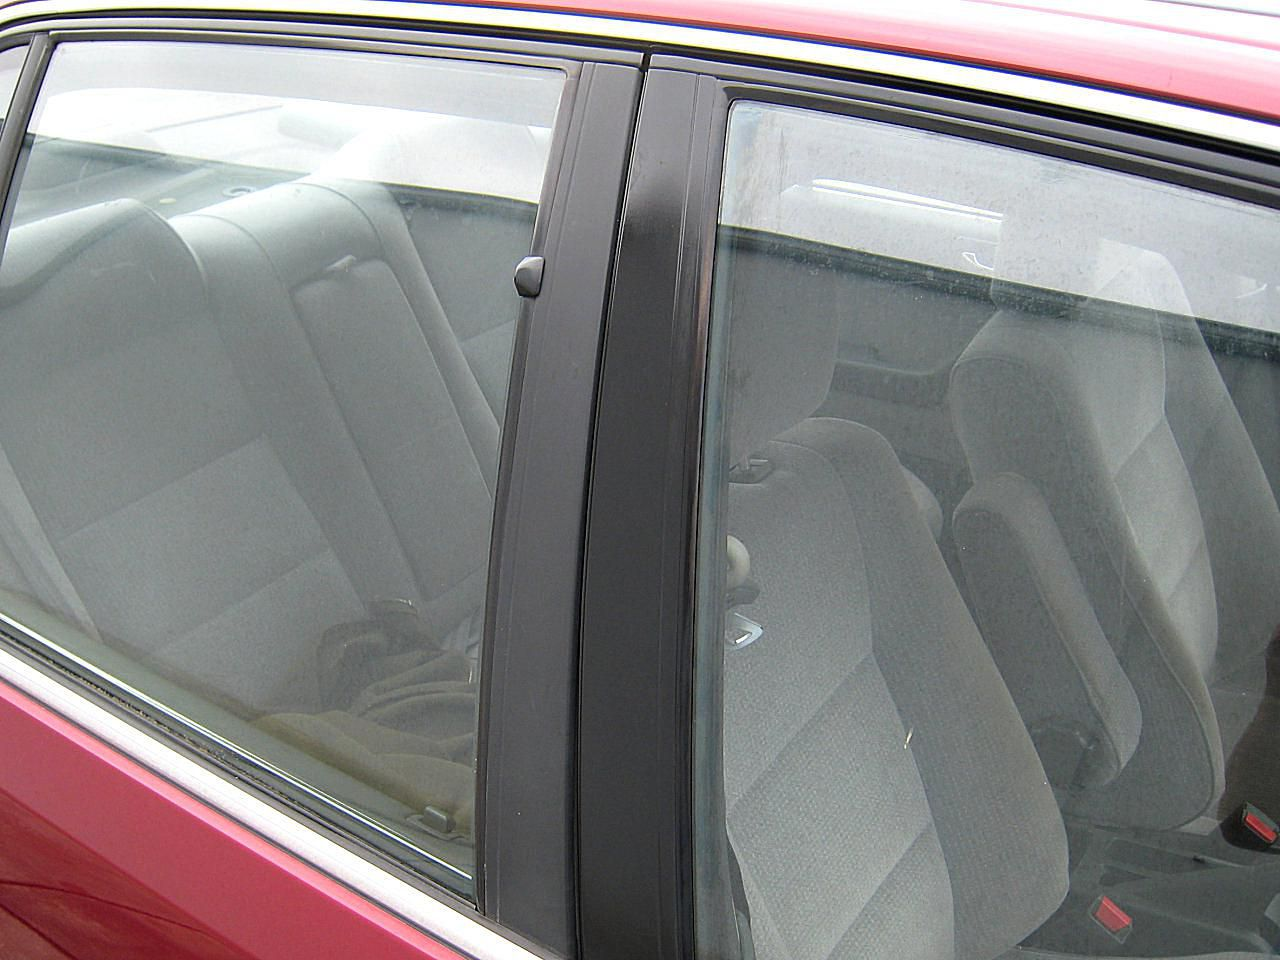 How to detail a car - treated black trim